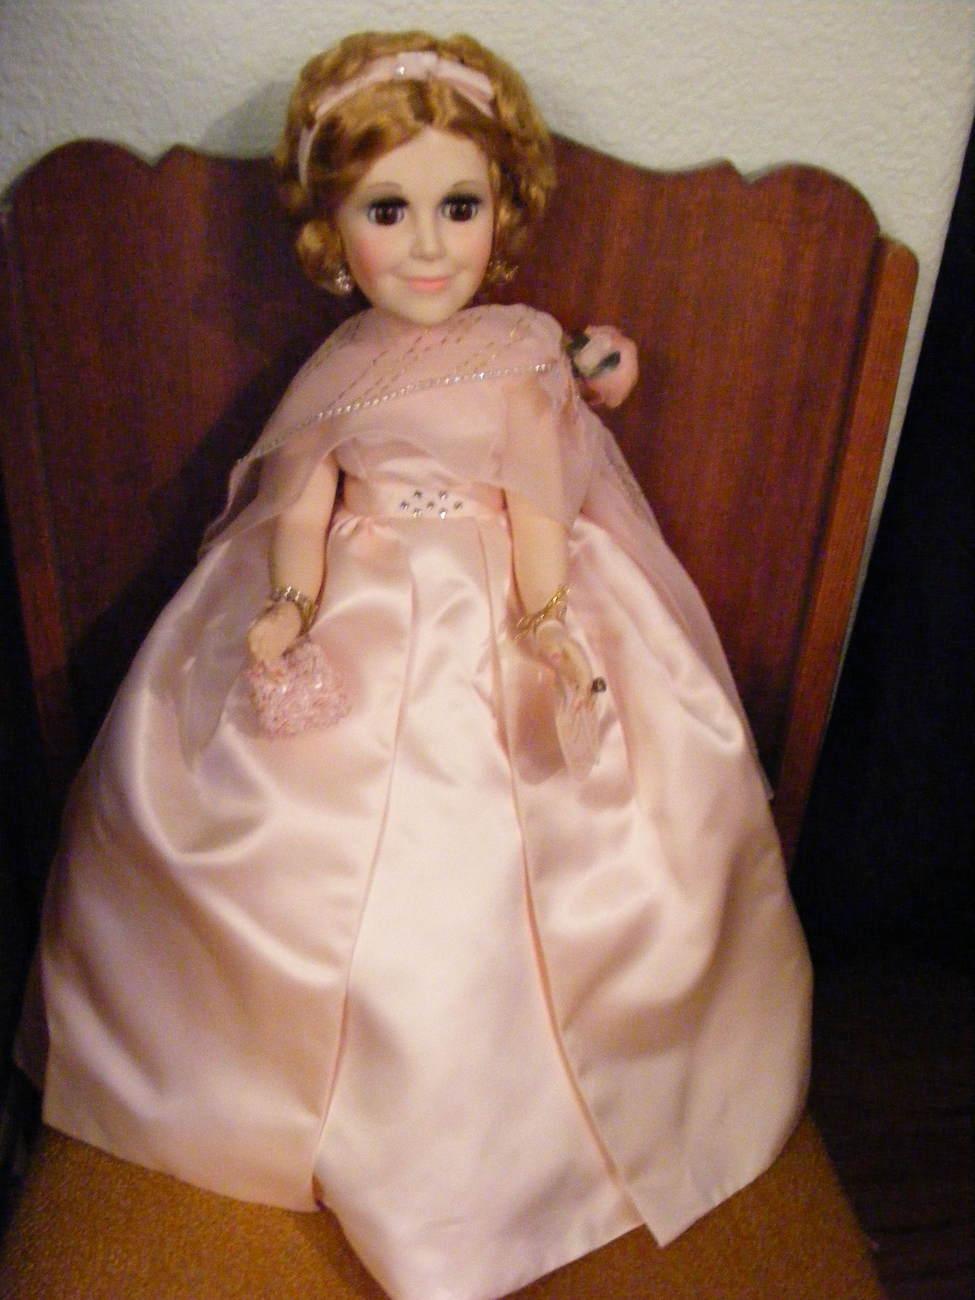 Vintage Madame Alexander Large Self Portrait Doll 299$ Tribu